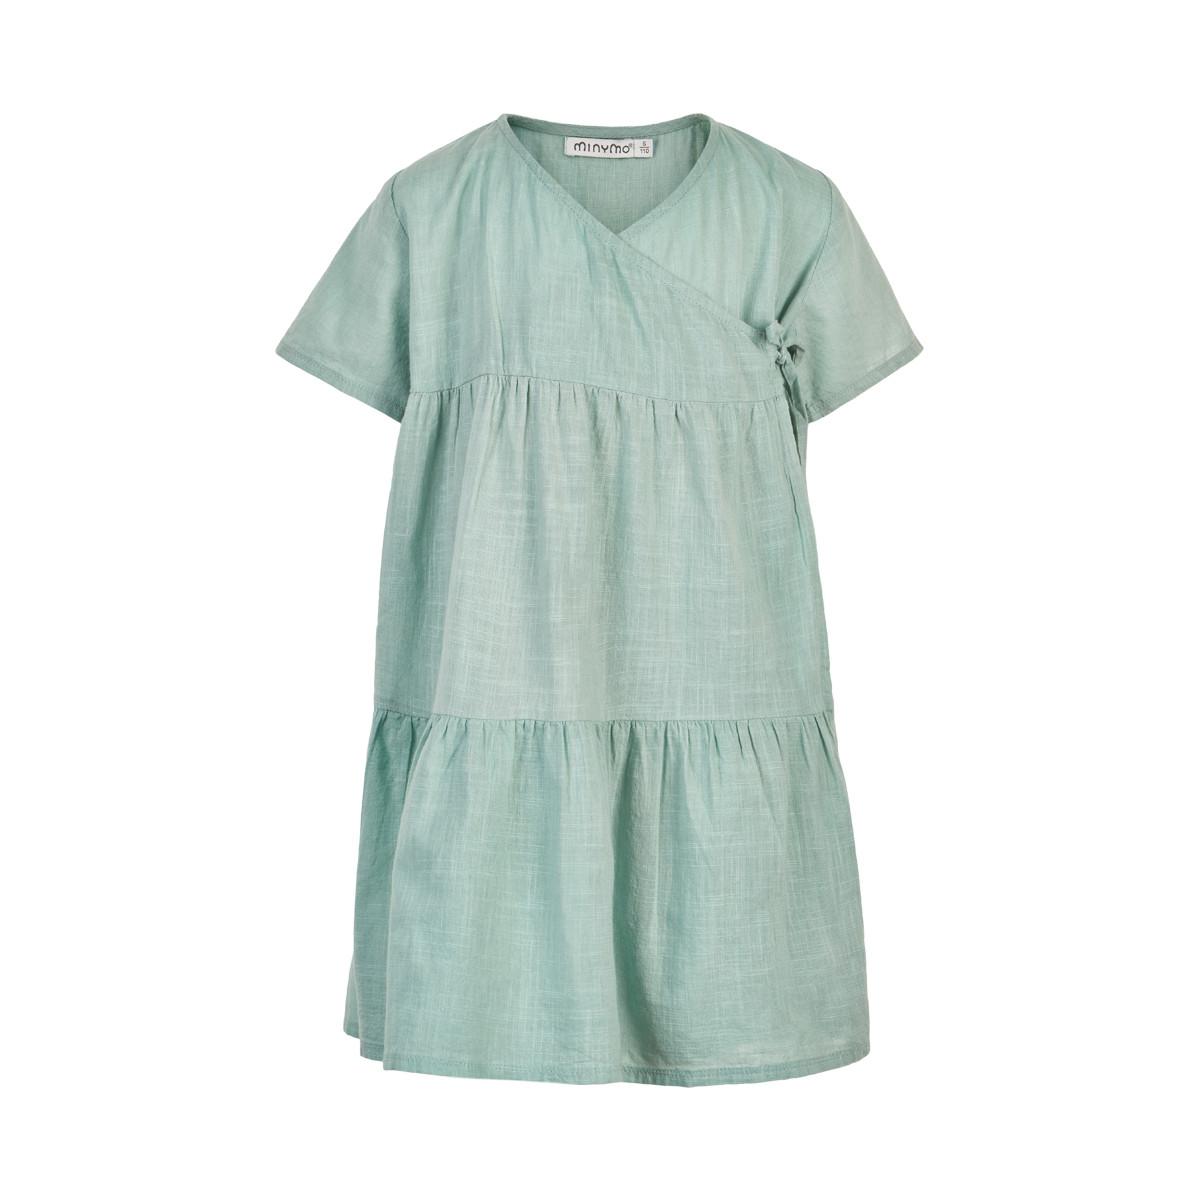 Minymo   Dress   12m-10y   121467-9120